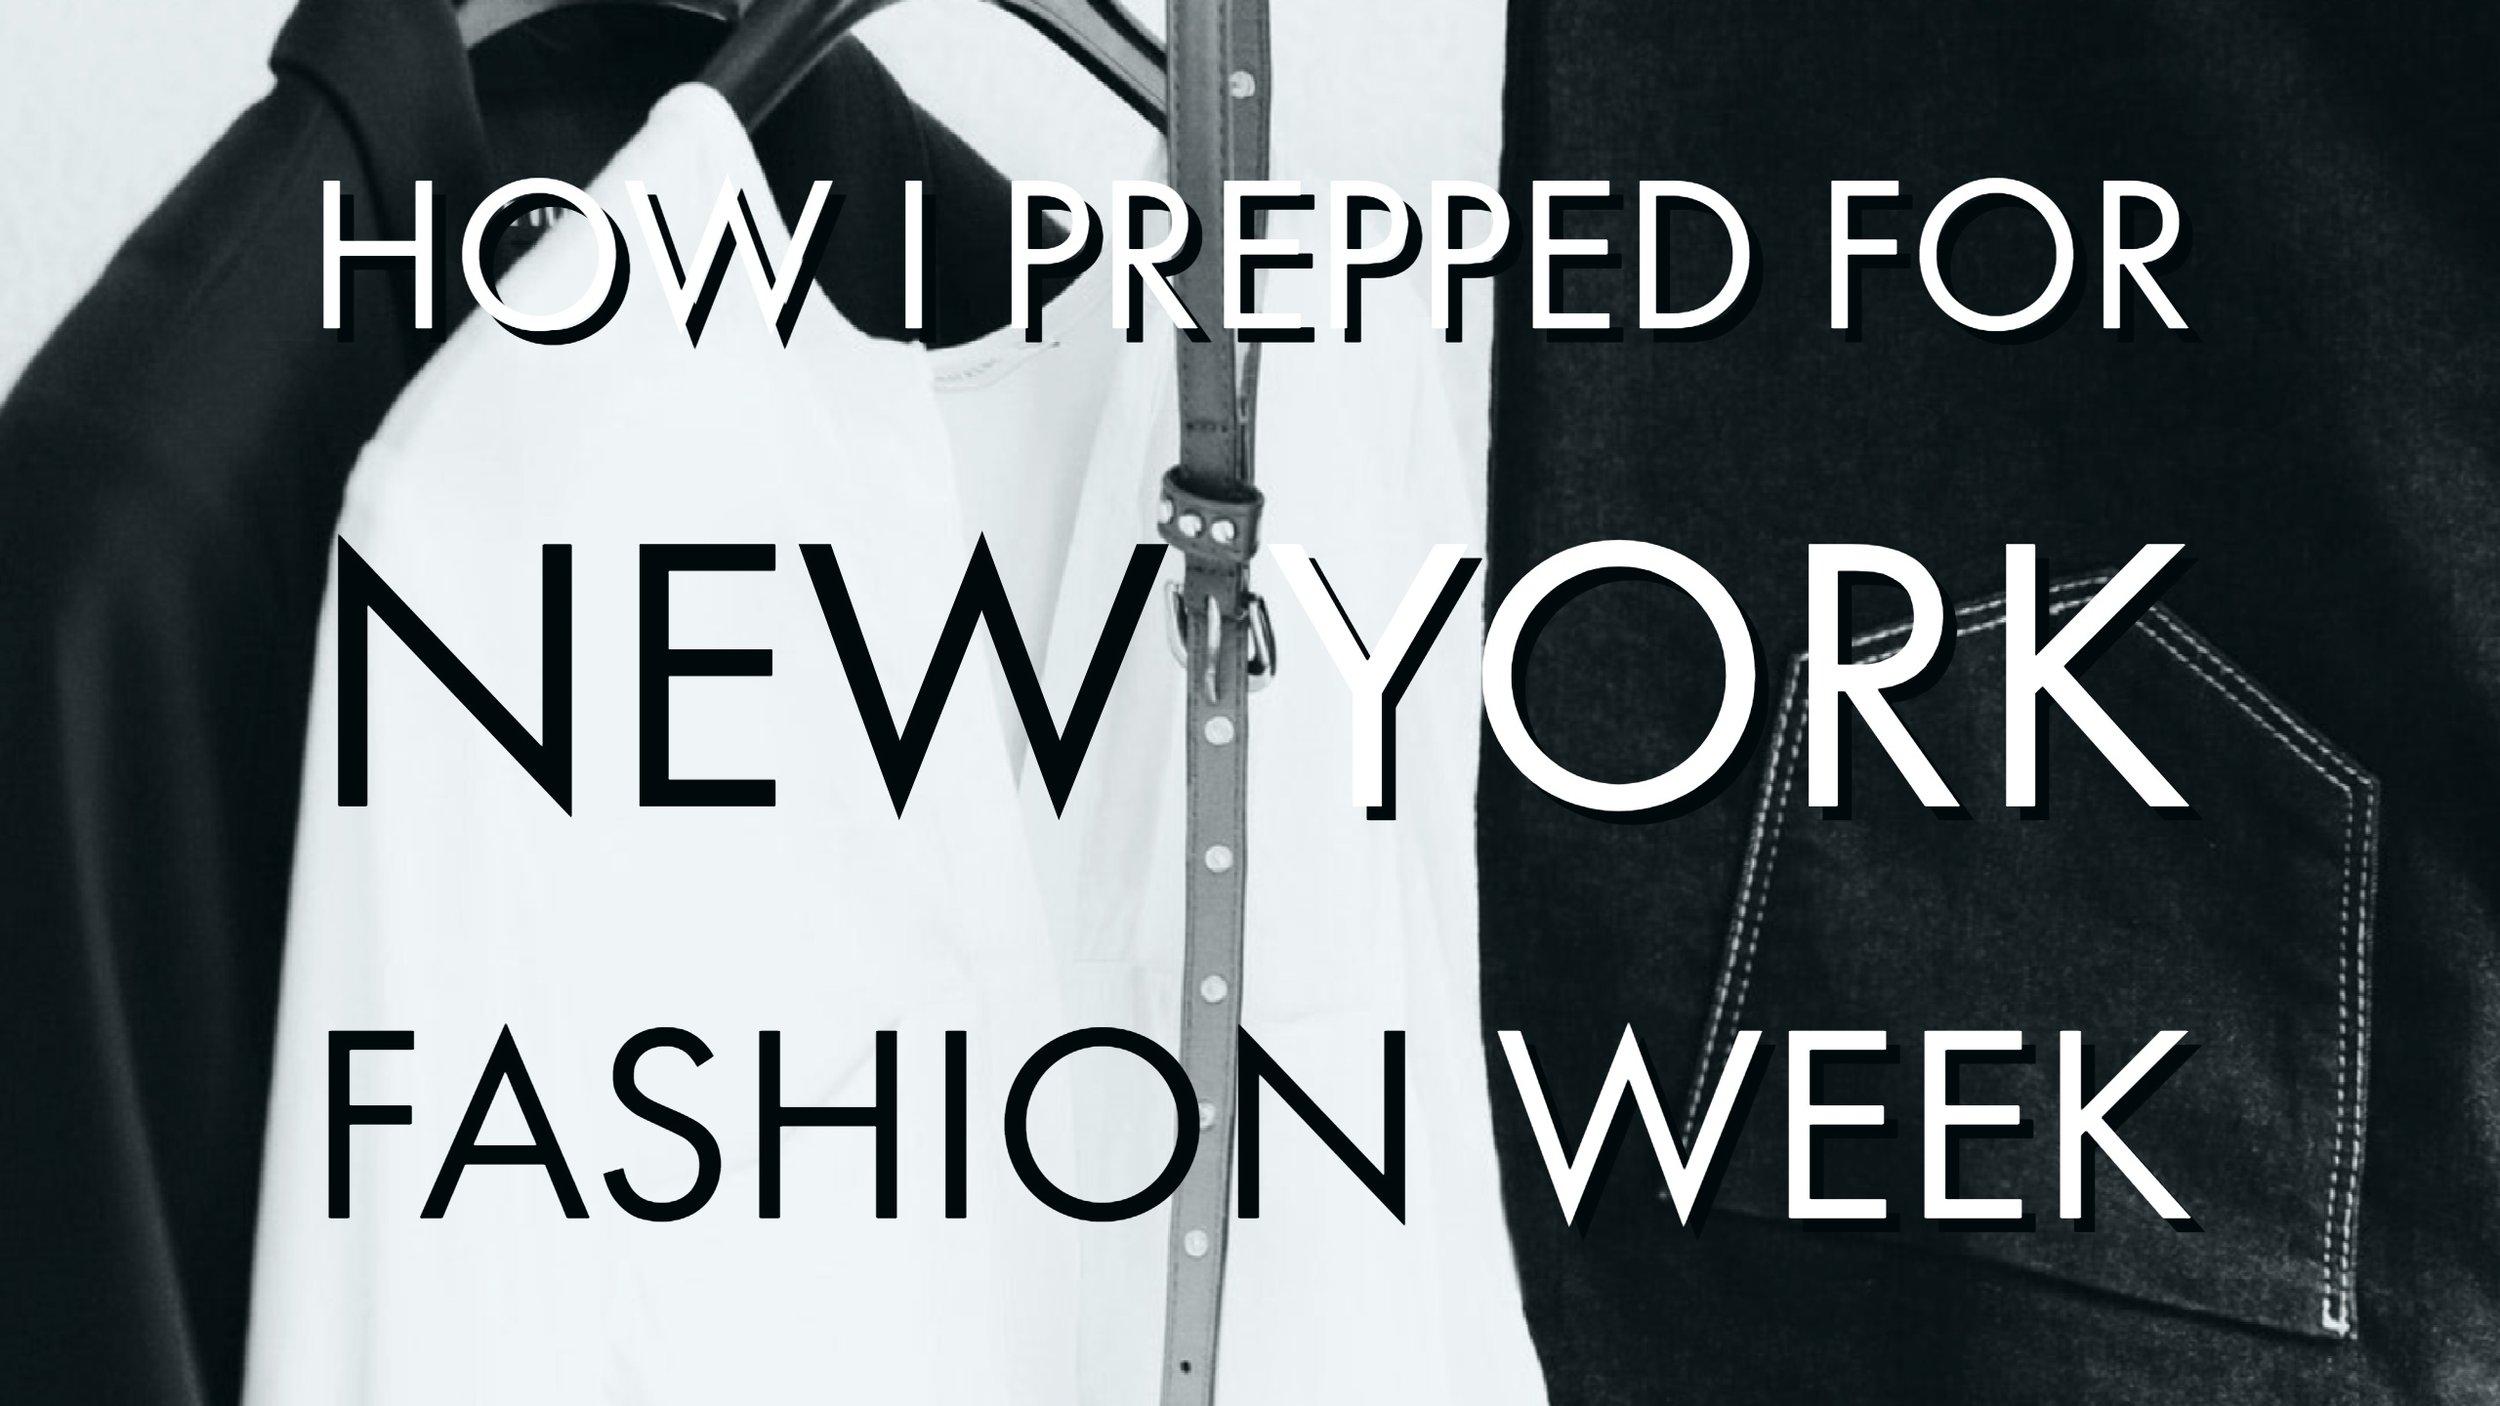 new york fashion week.jpg